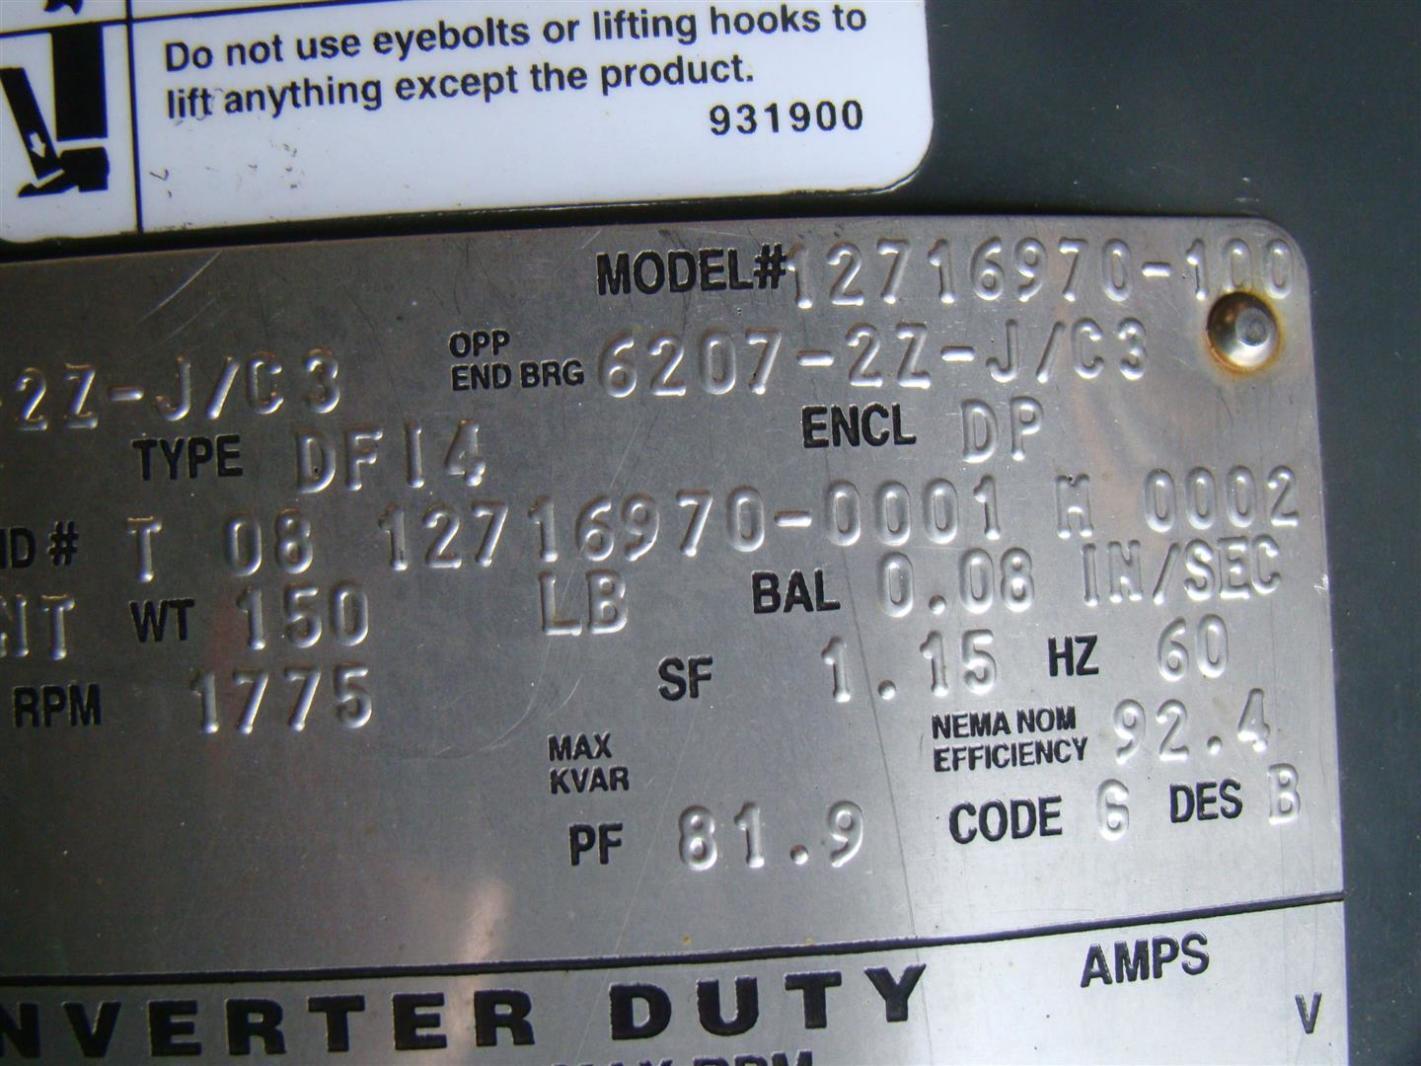 Us motors nidec 3 phase electric motor inverter duty 15 hp 1775 us motors nidec 3 phase electric motor inverter duty 15 hp 1775 rpm model 127169 publicscrutiny Images